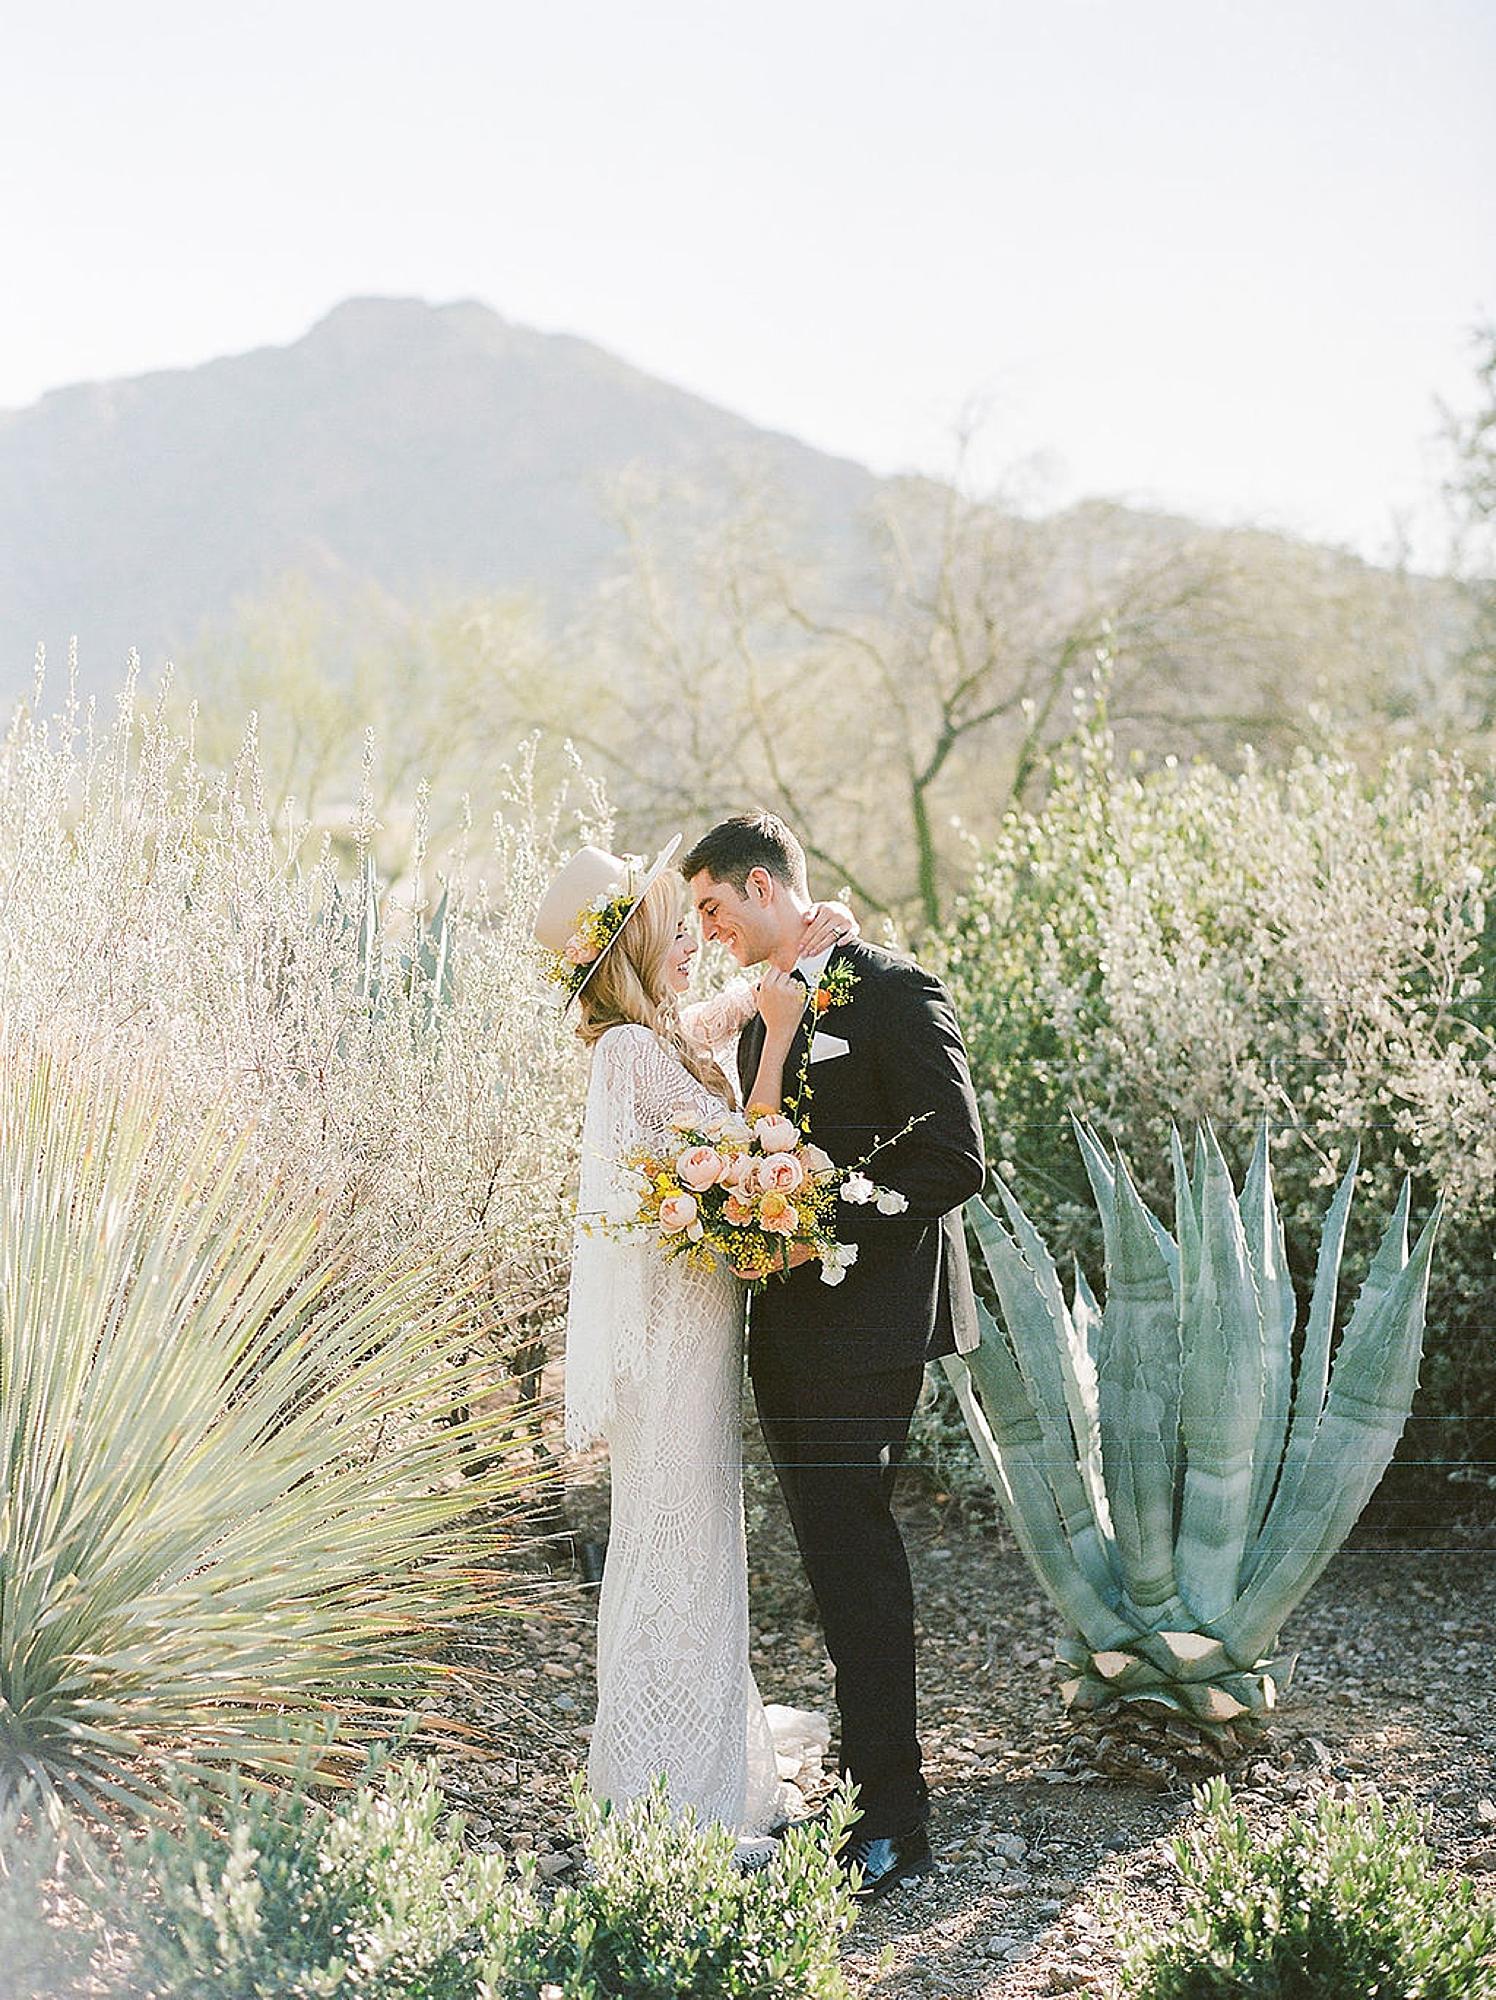 El Chorro Sedona AZ Wedding Photography by Magi Fisher of Magdalena Studios 0036